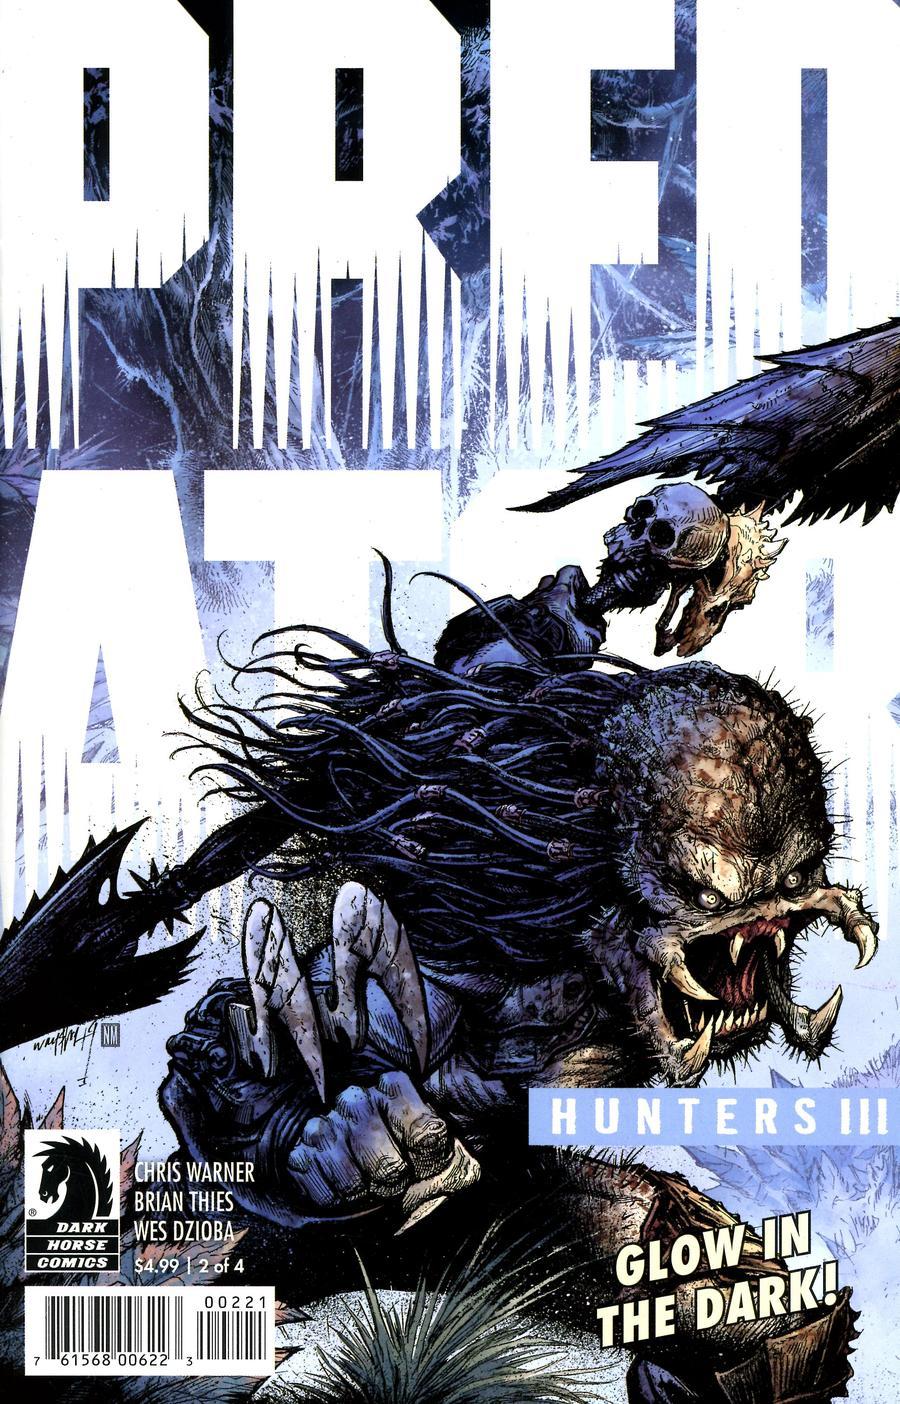 Predator Hunters III #2 Cover B Variant Jonathan Wayshak Glow-In-The-Dark Ink Cover